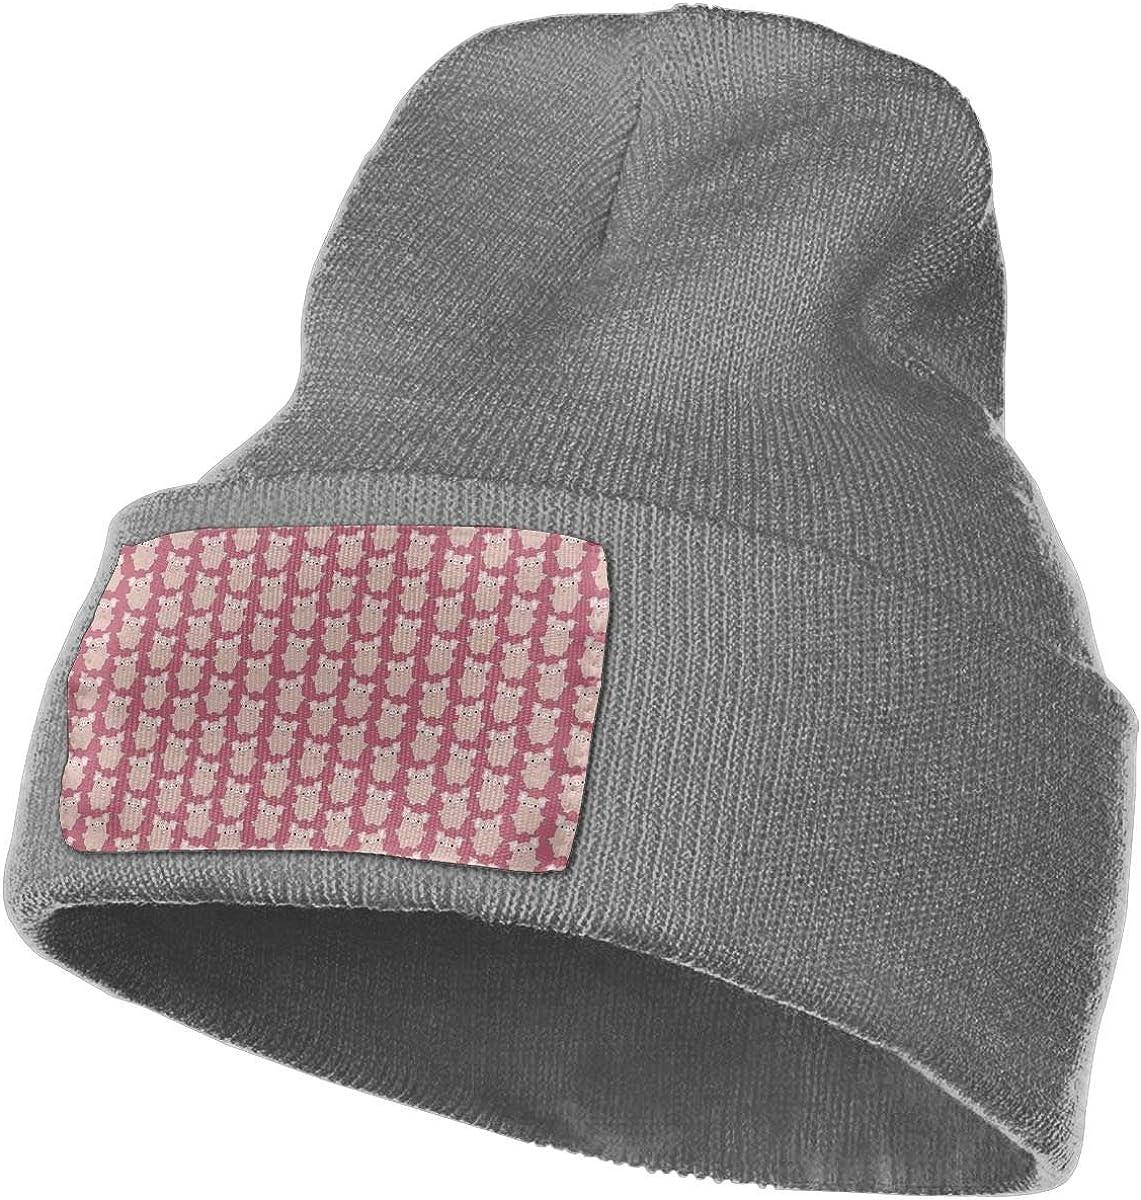 Cute Cartoon Pigs Winter Wool Cap Warm Beanies Knitted Hat